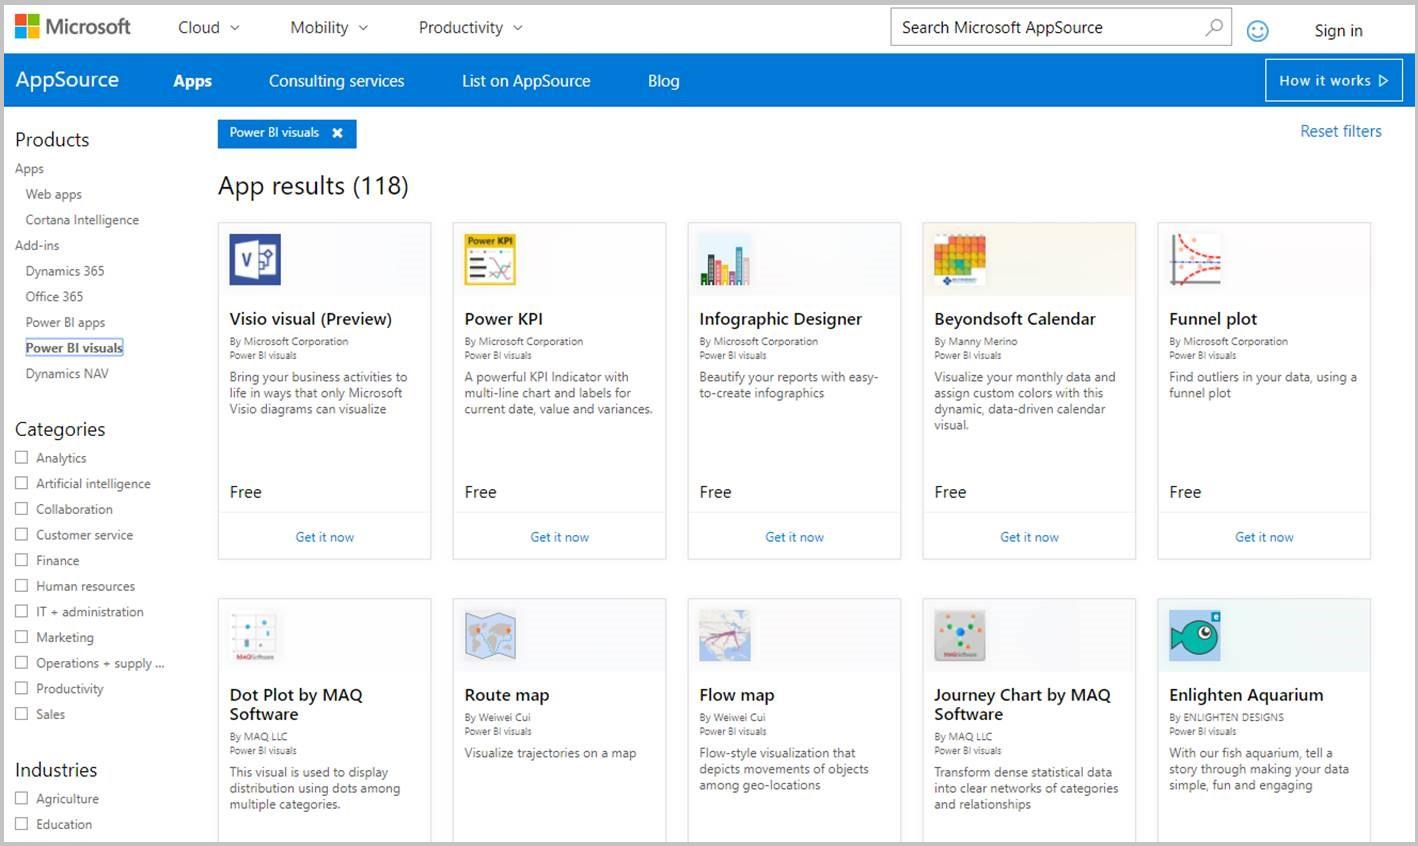 Publish custom visuals to AppSource - Power BI | Microsoft Docs